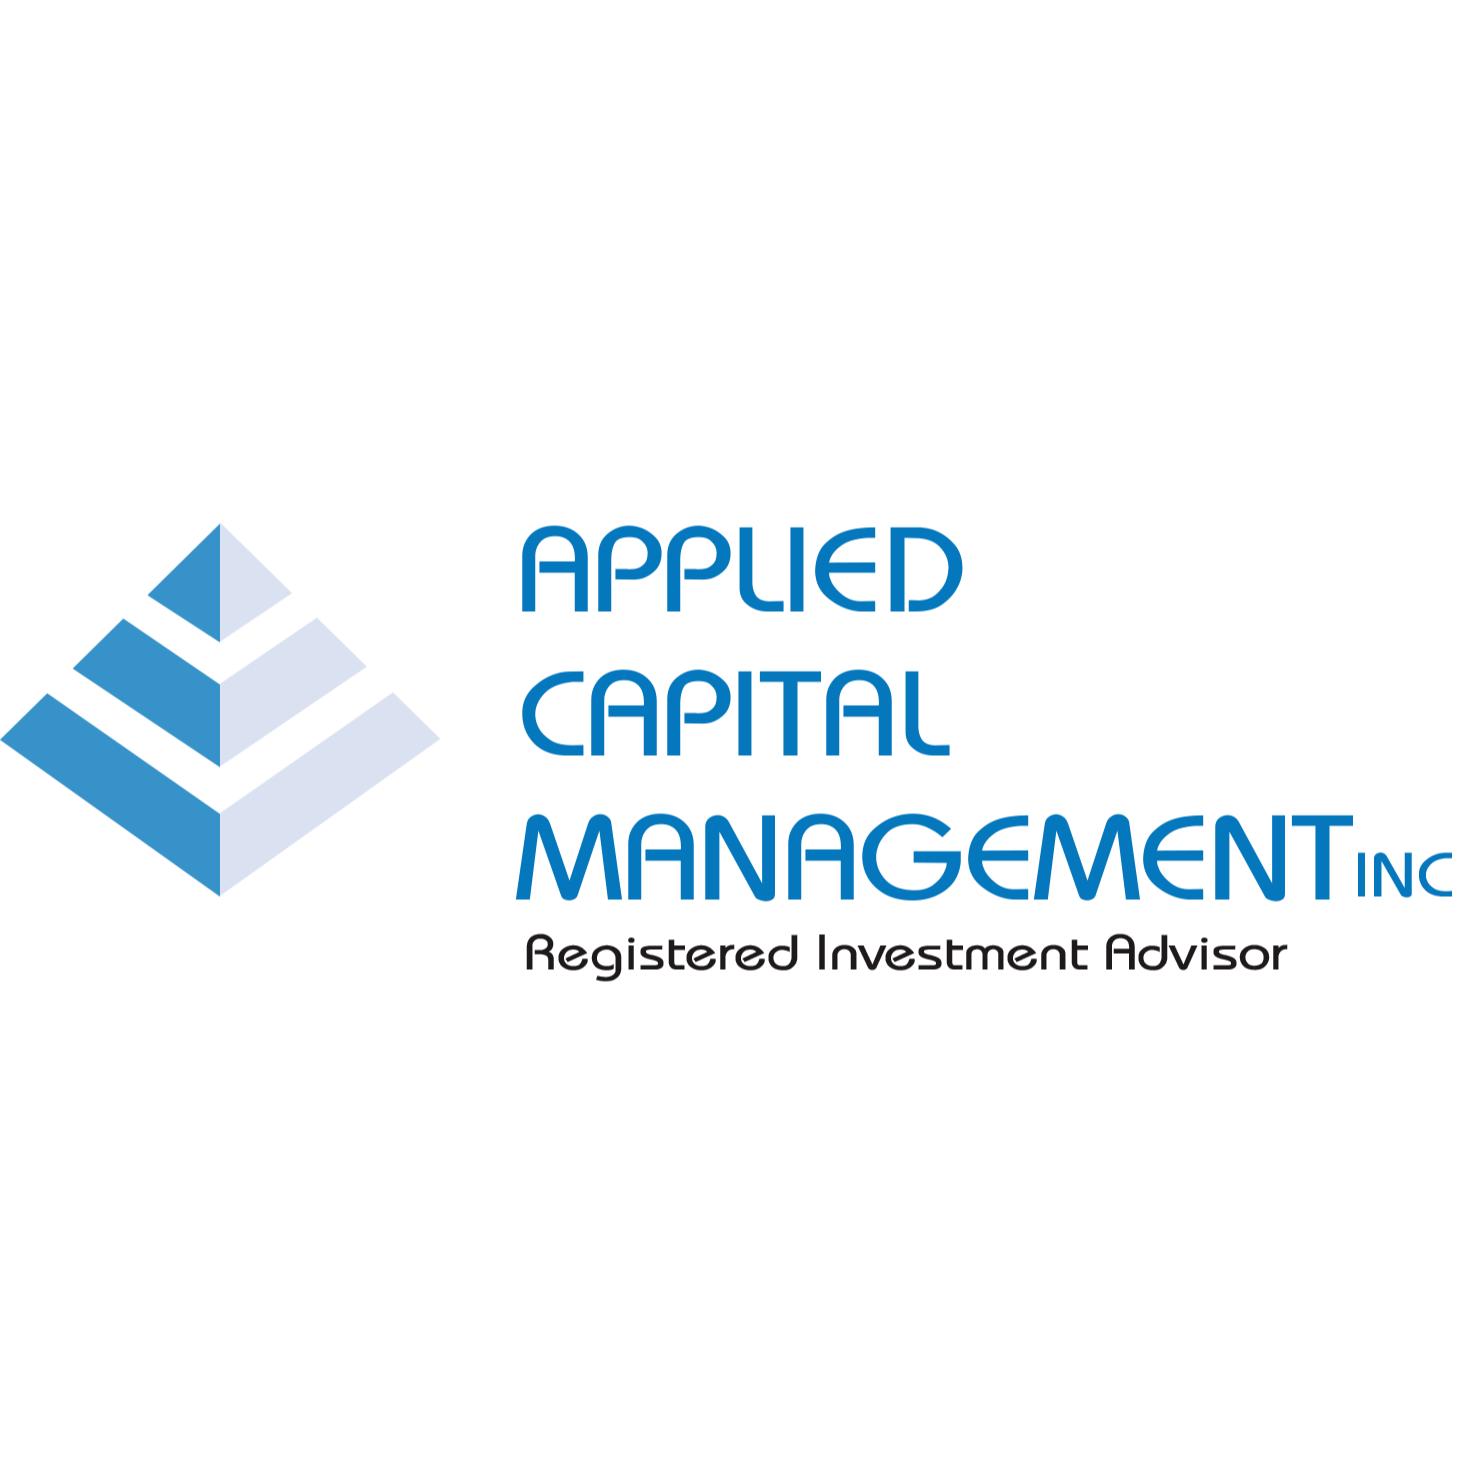 Applied Capital Management, Inc.